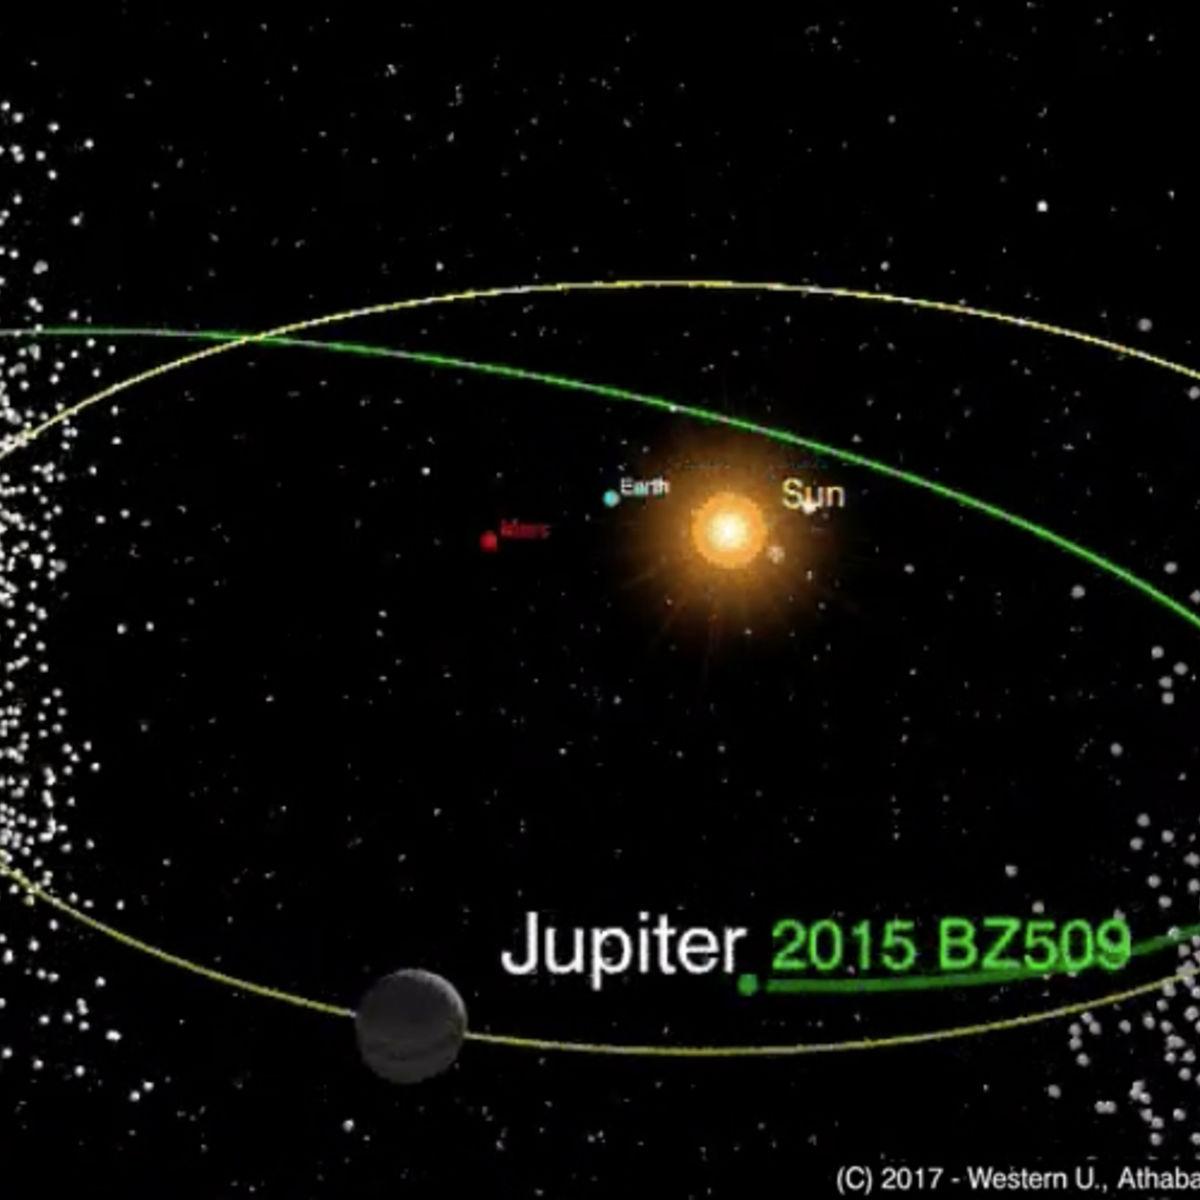 orbit of asteroid 2015 BZ509 and Jupiter